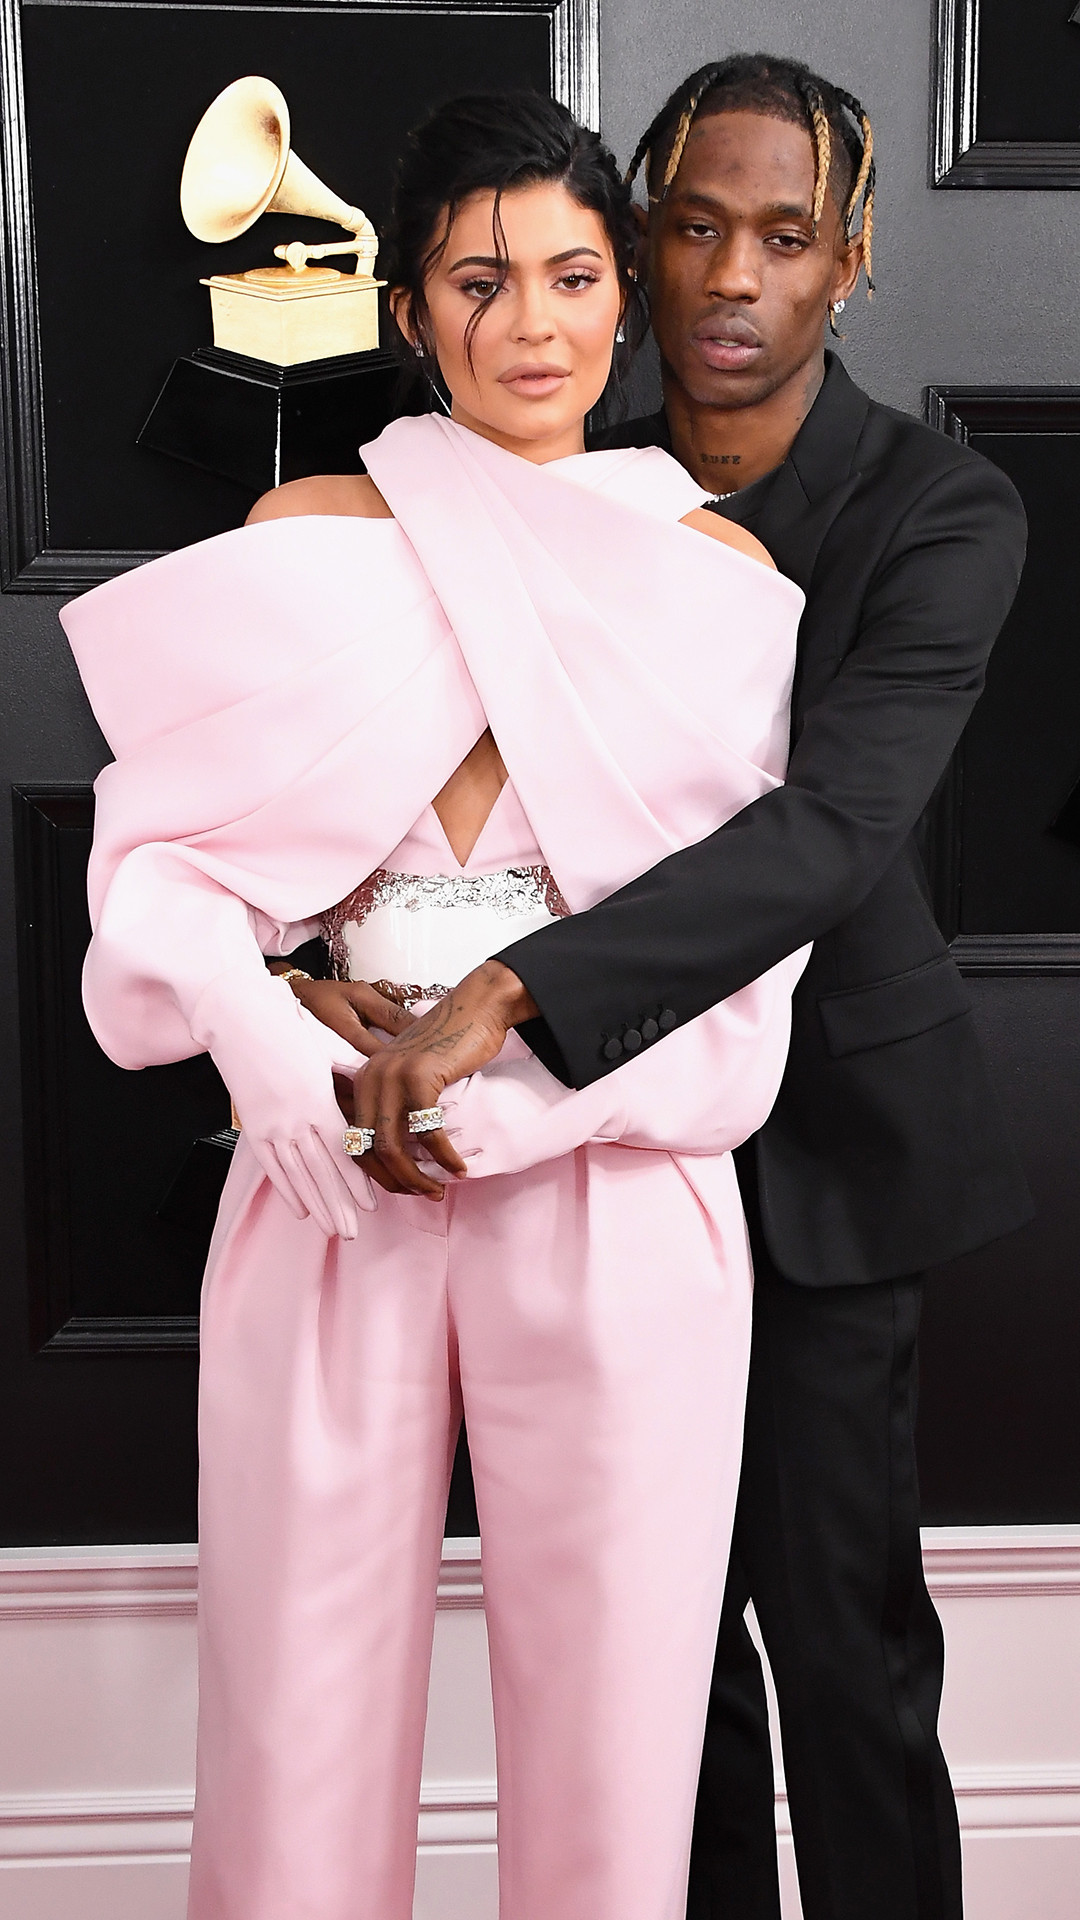 Travis Scott, Kylie Jenner, 2019 Grammys, 2019 Grammy Awards, Couples